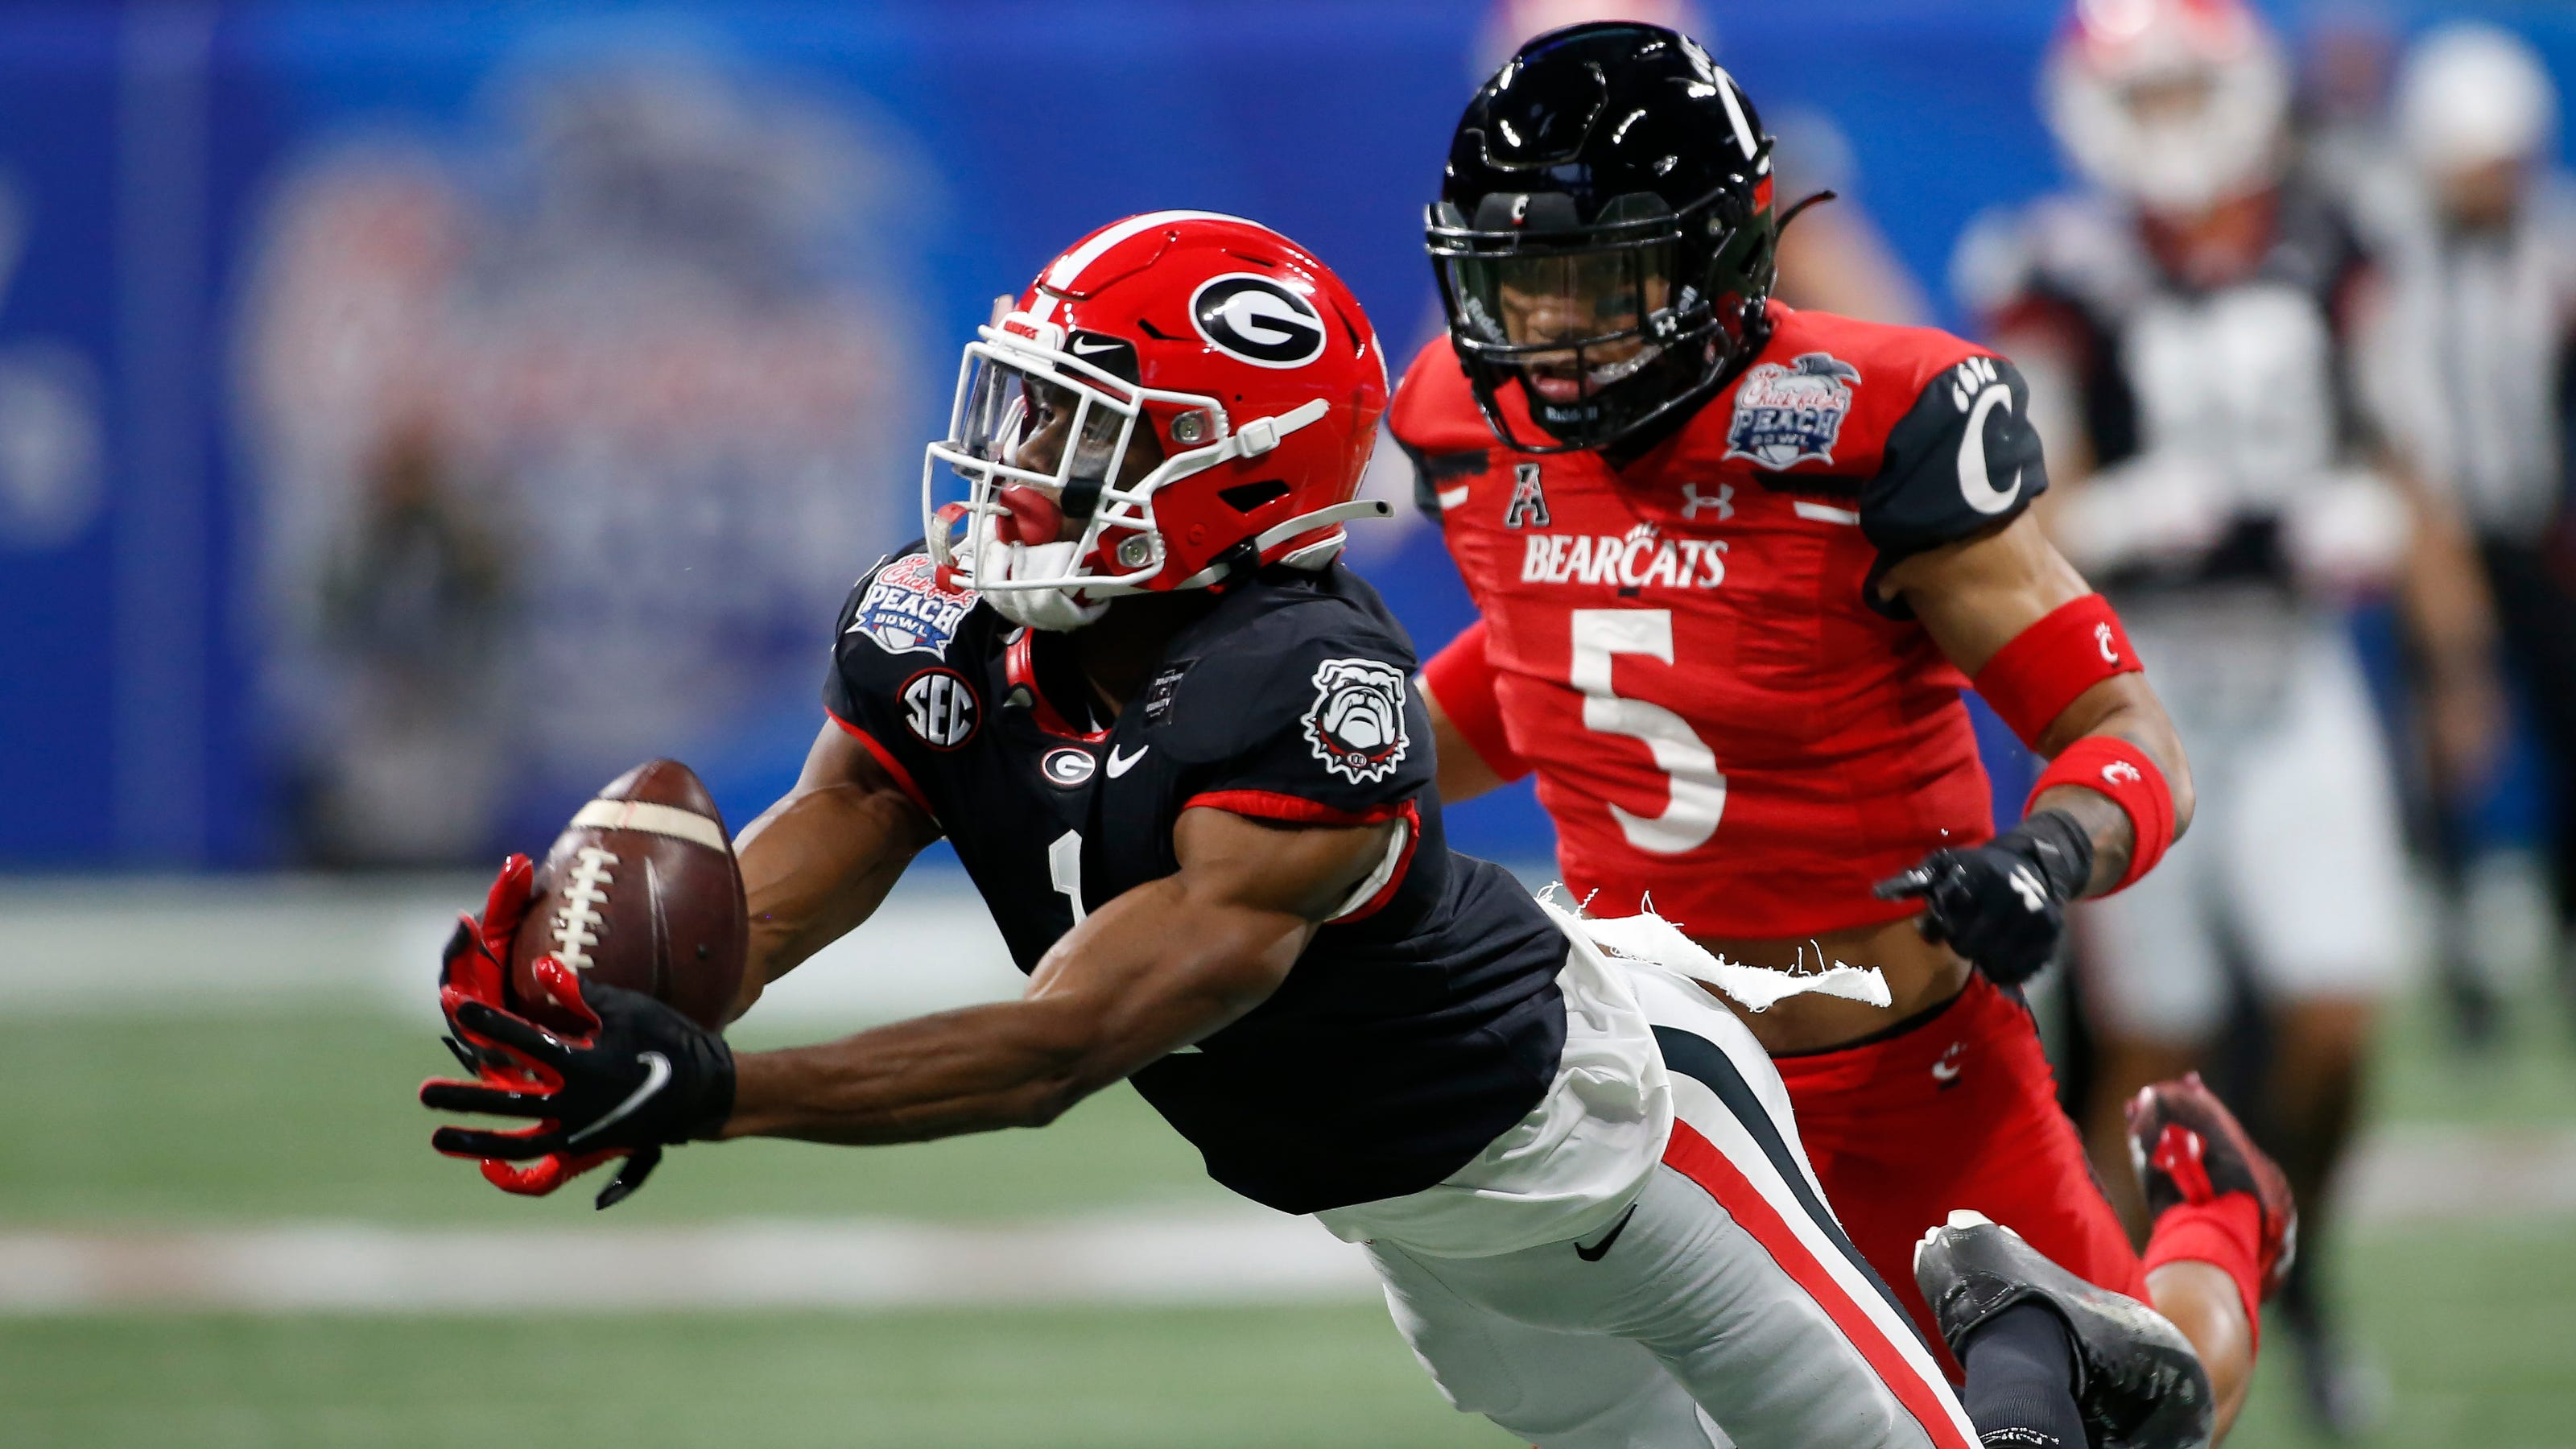 UGA v. Cincinnati Peach Bowl: 5 takeaways from Bulldogs' win